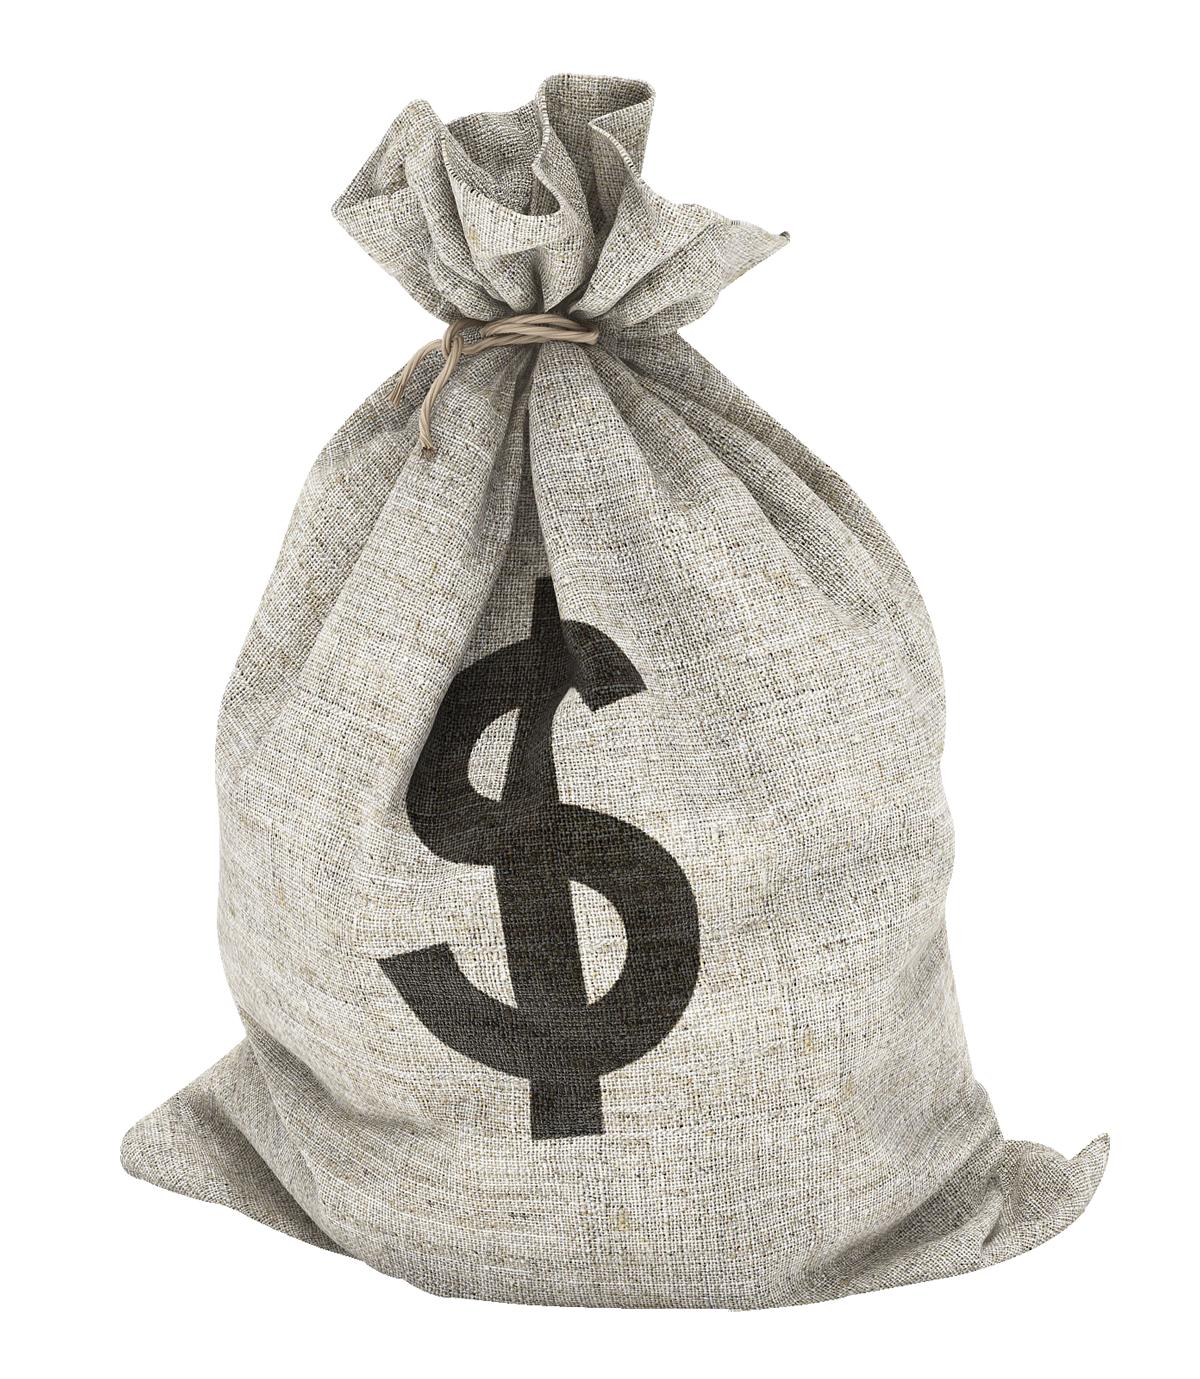 Money Bag Png Image Money Bag Money Bag Tattoo Dollar Money